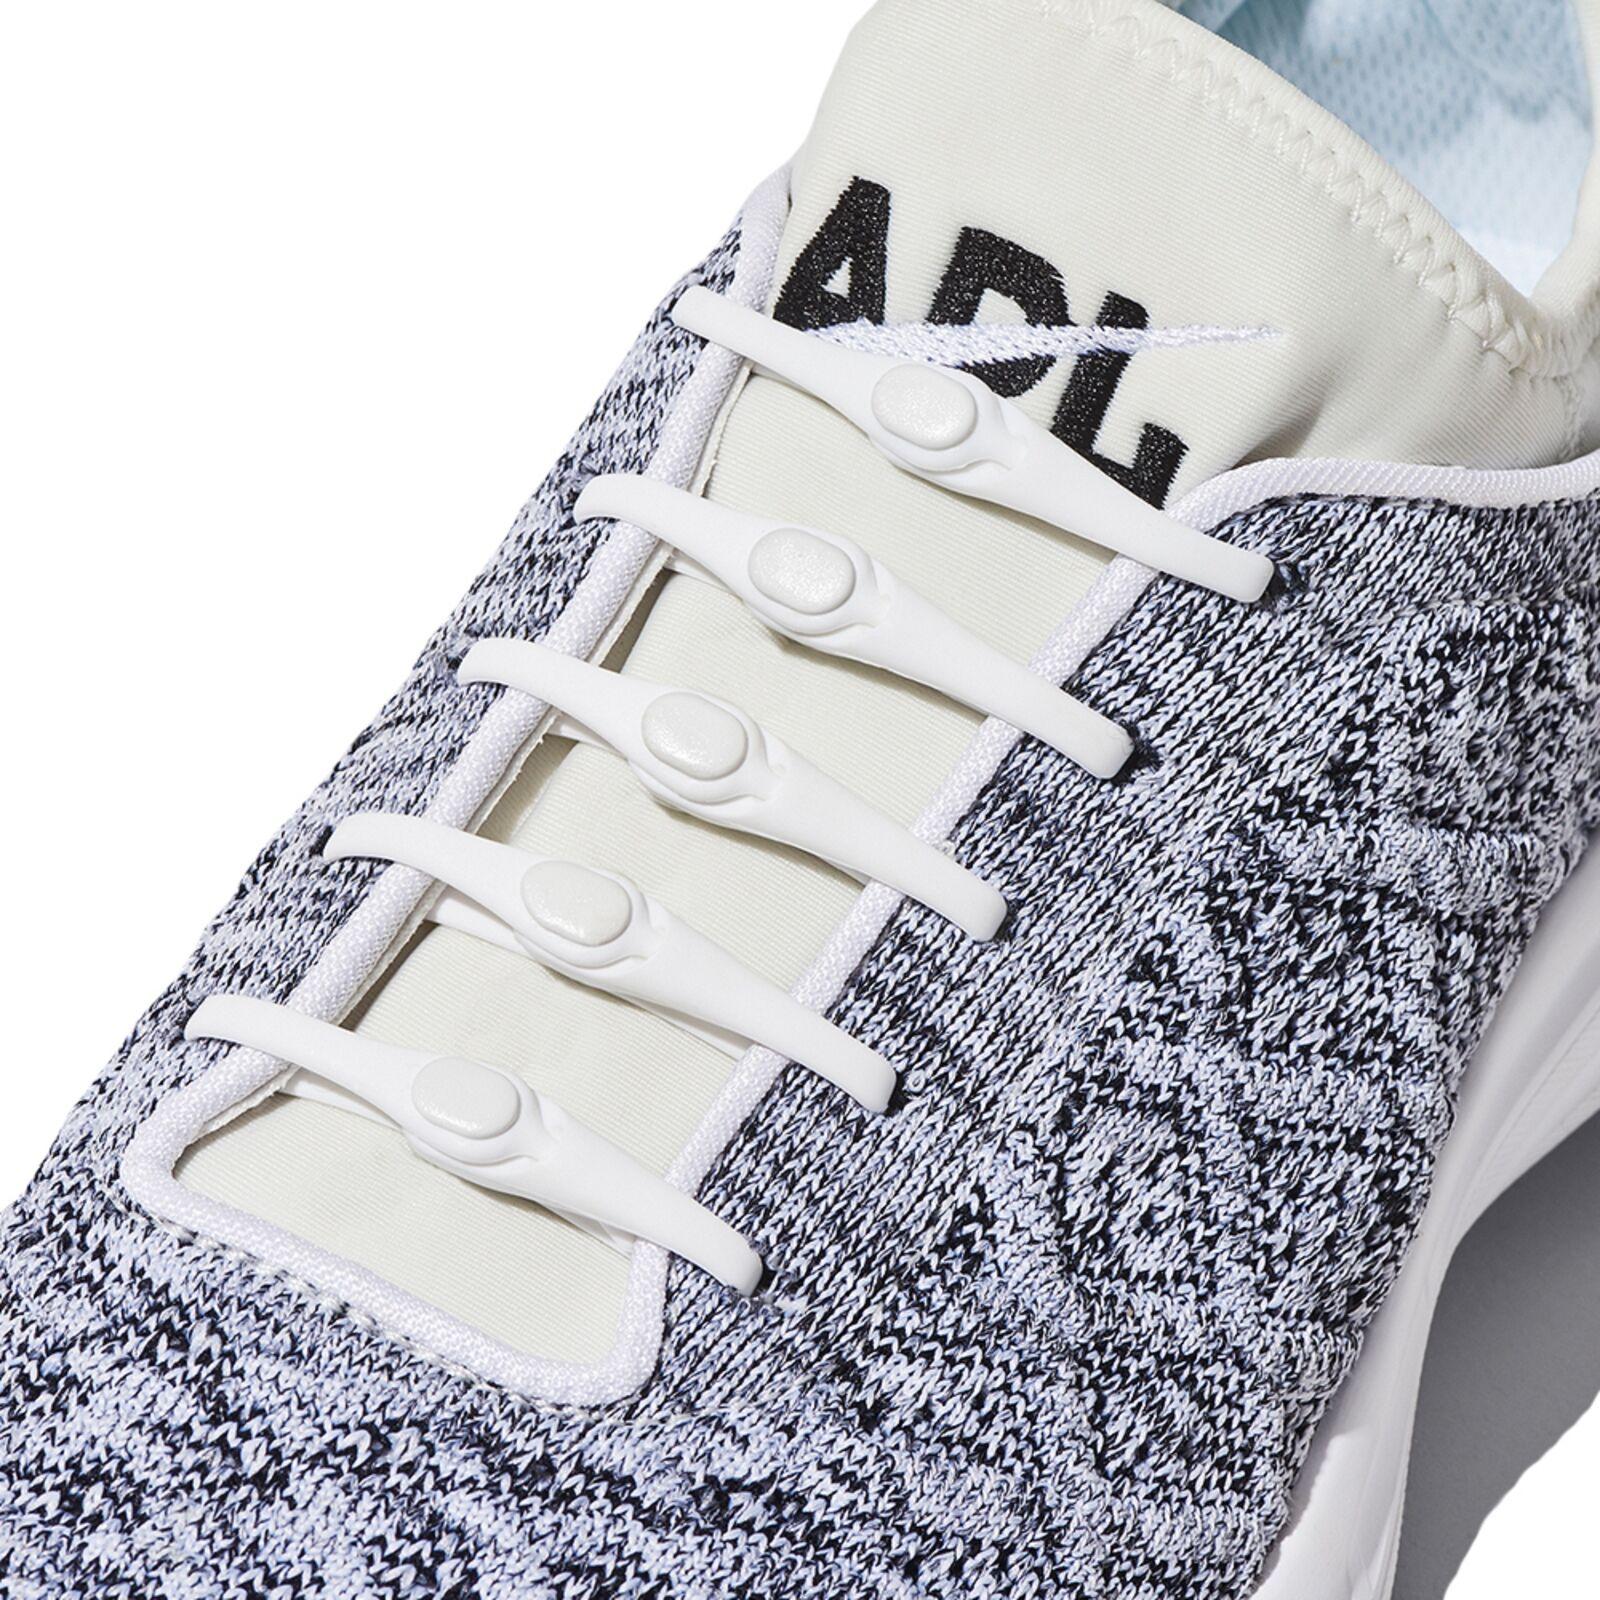 Size Fits All Elastic No-Tie Shoelaces